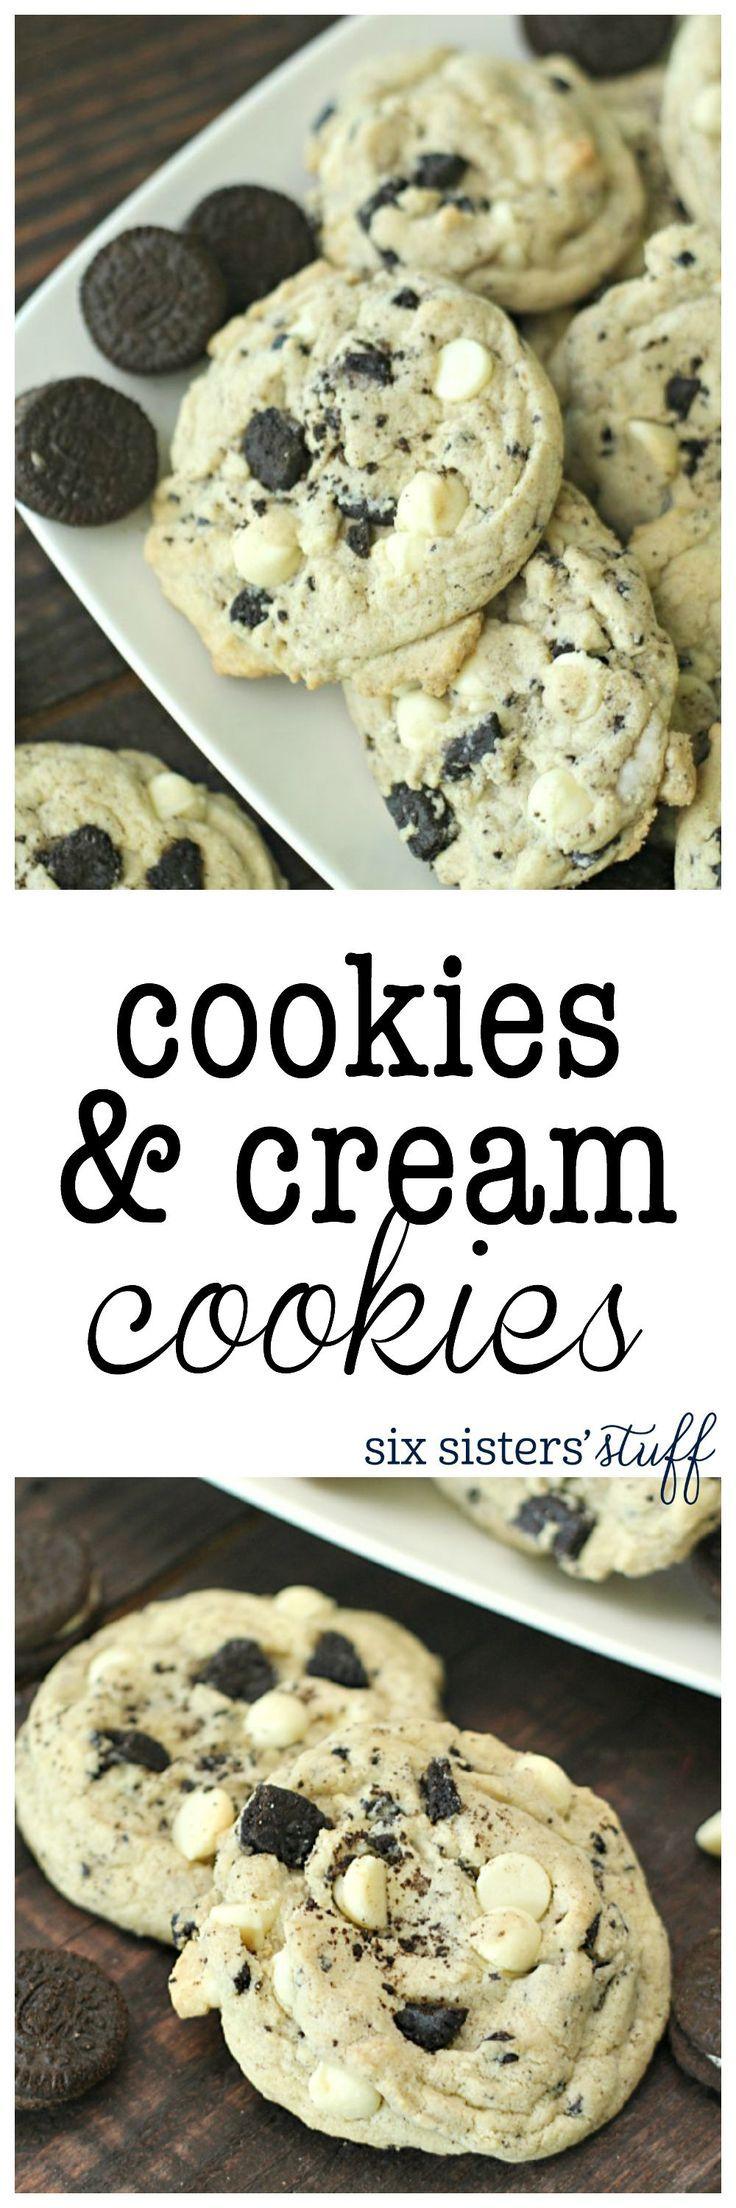 Cookies and Cream Cookies   Recipe   Pinterest   Cream cookies ...